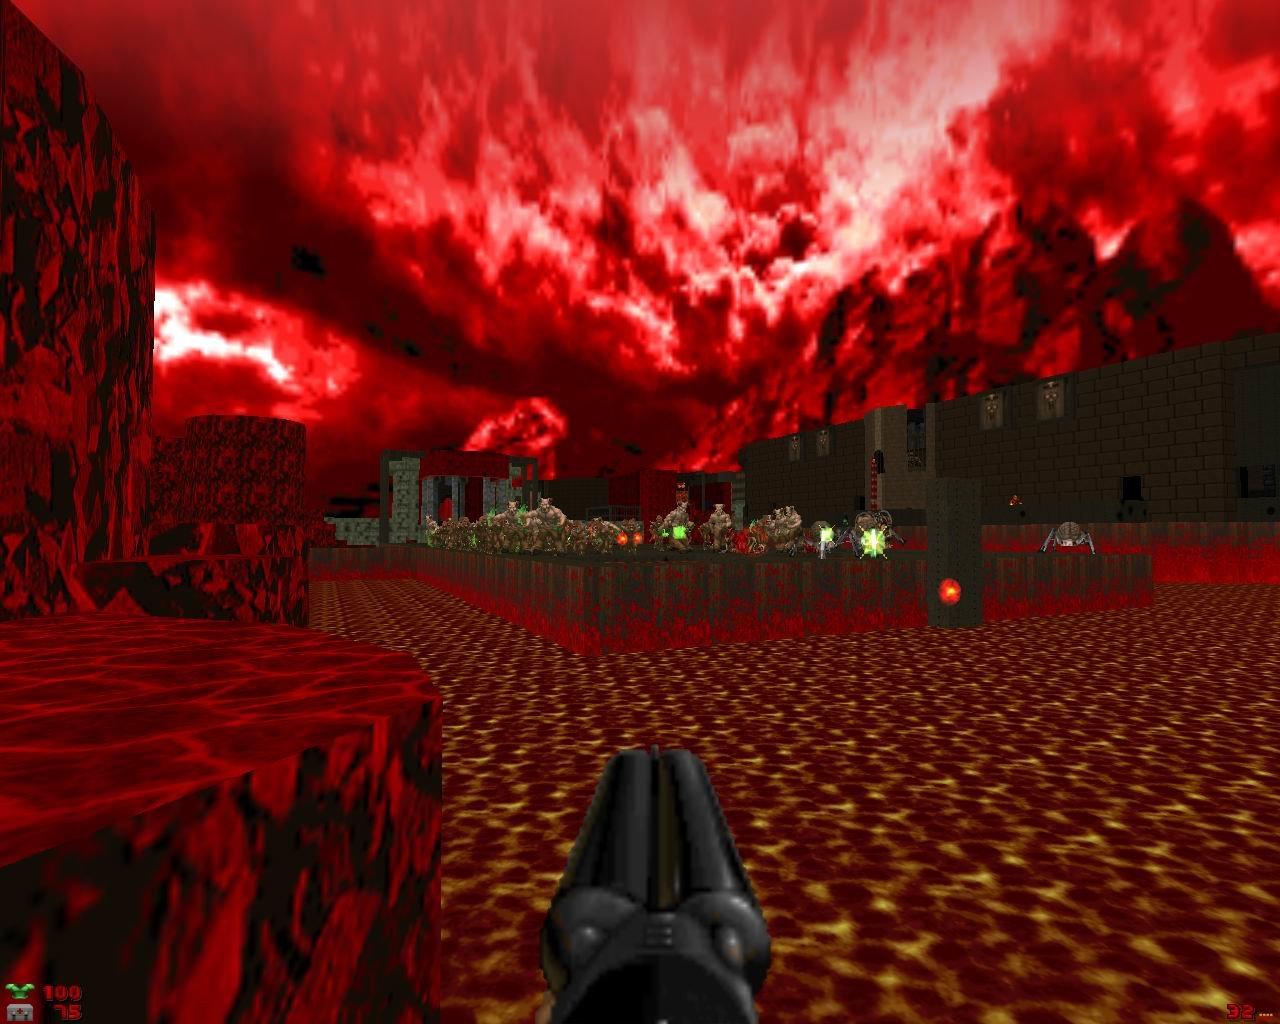 Screenshot_Doom_20210410_144934.jpg.207c696b62b6c422e2eb2a7b1a458724.jpg